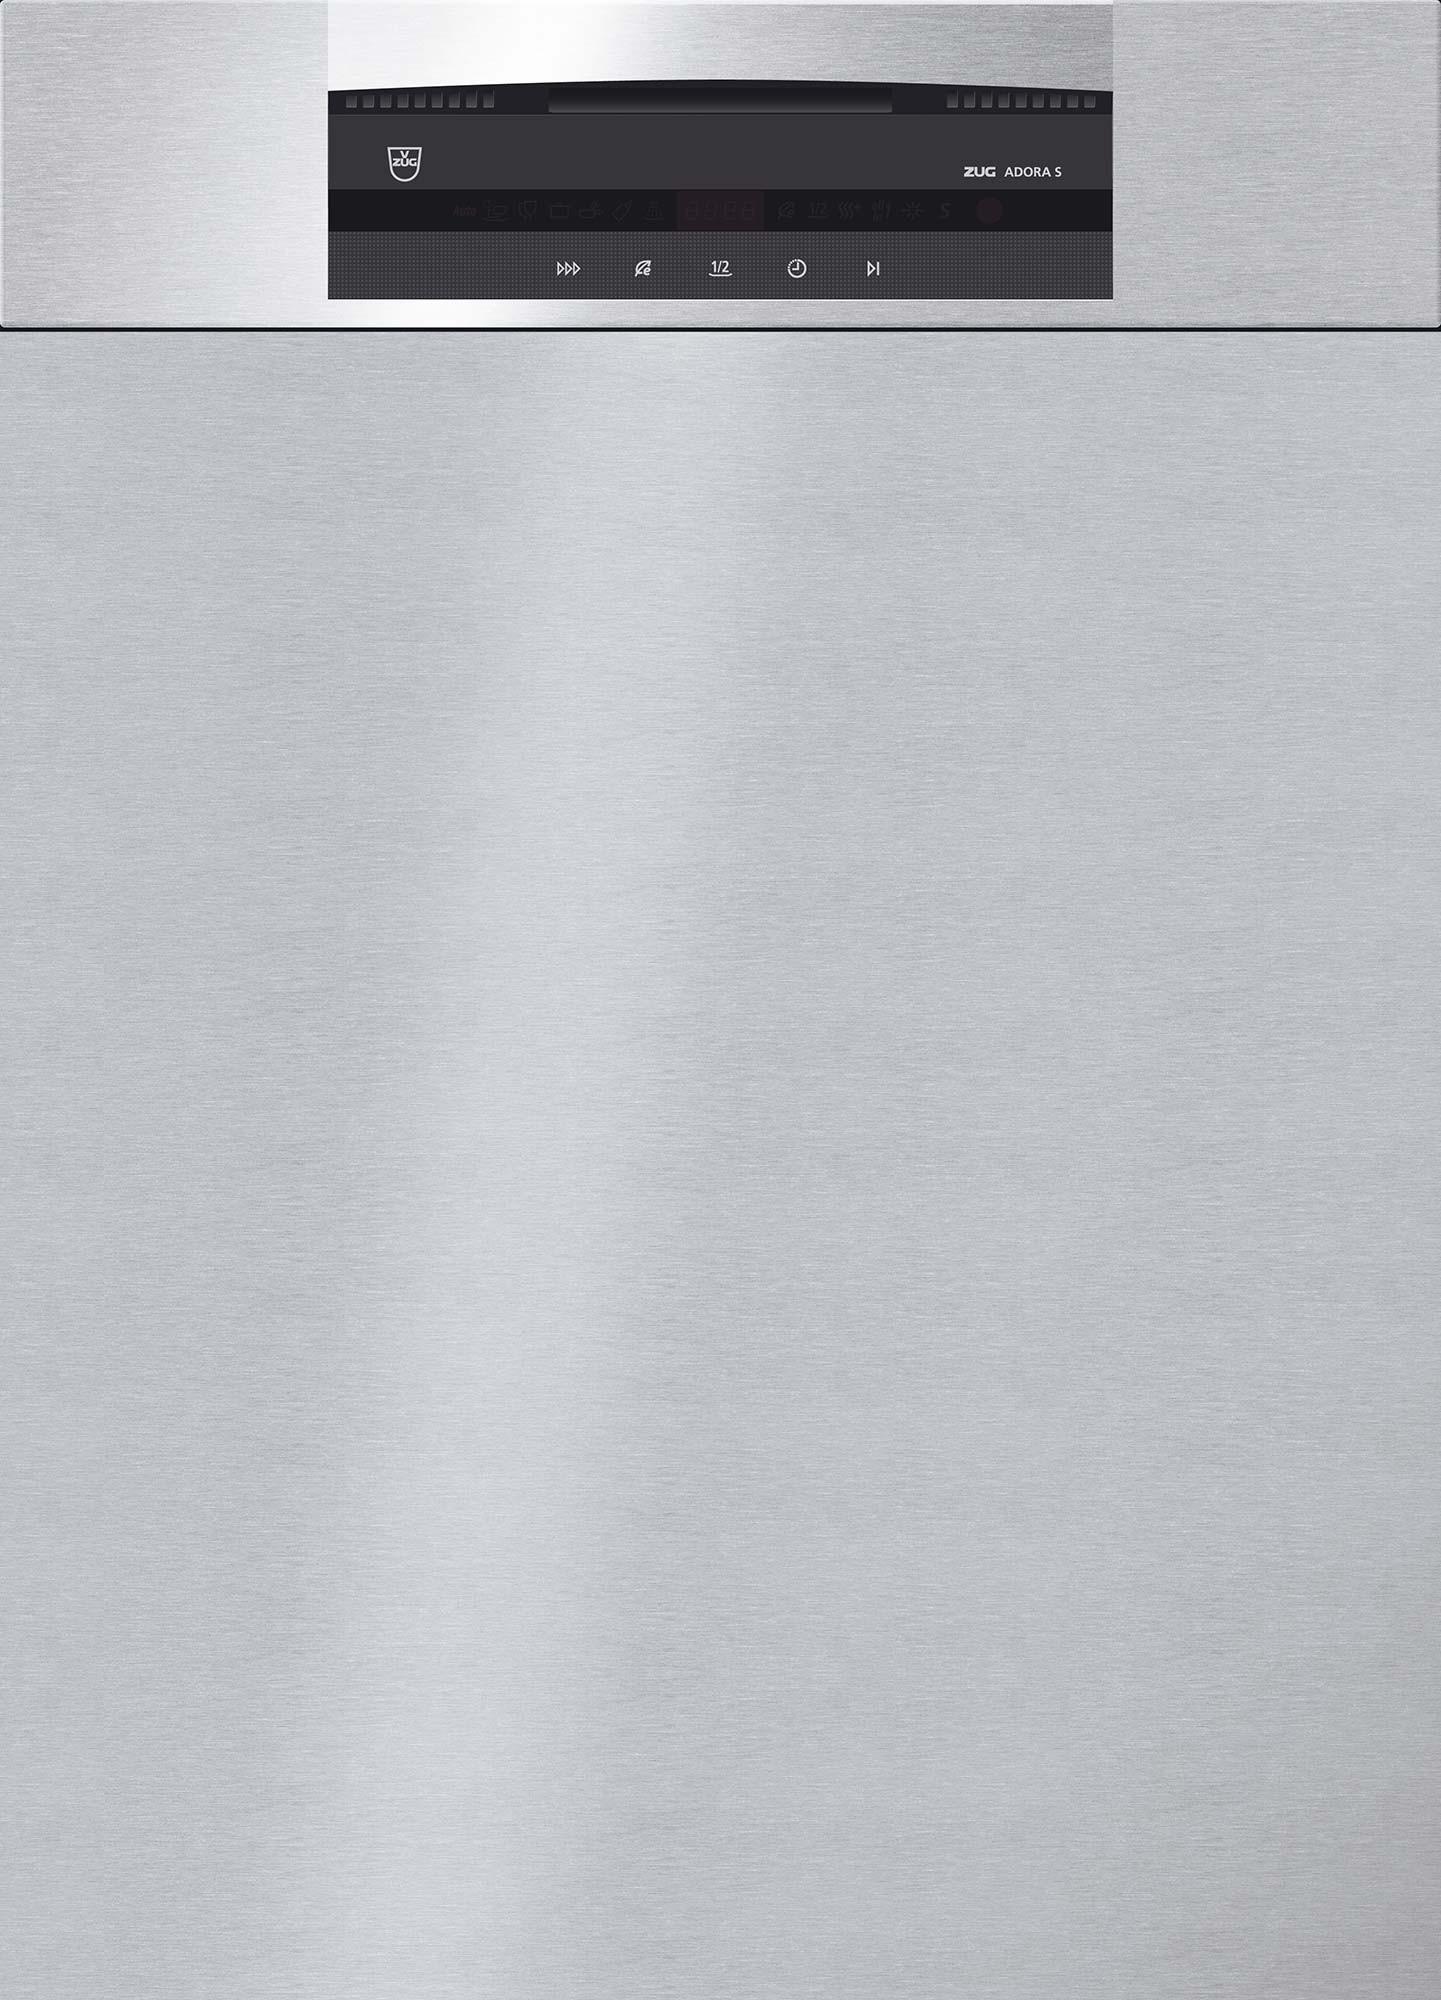 lave vaisselle zug norme suisse 55 cm adora 55 si chromclass. Black Bedroom Furniture Sets. Home Design Ideas